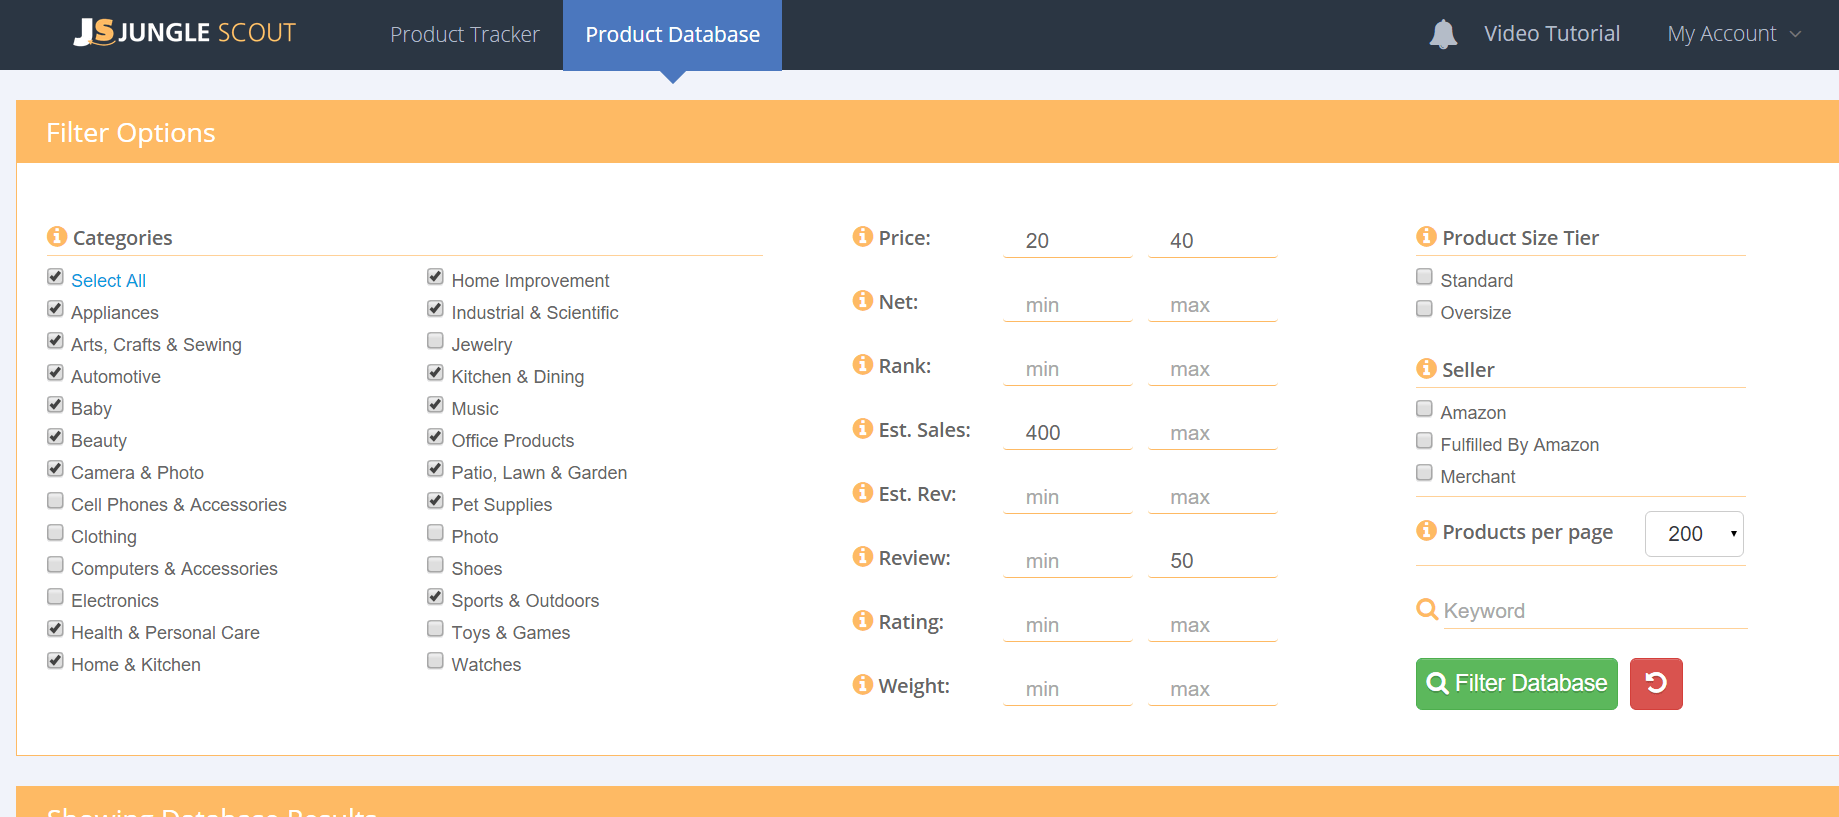 JS product database filter